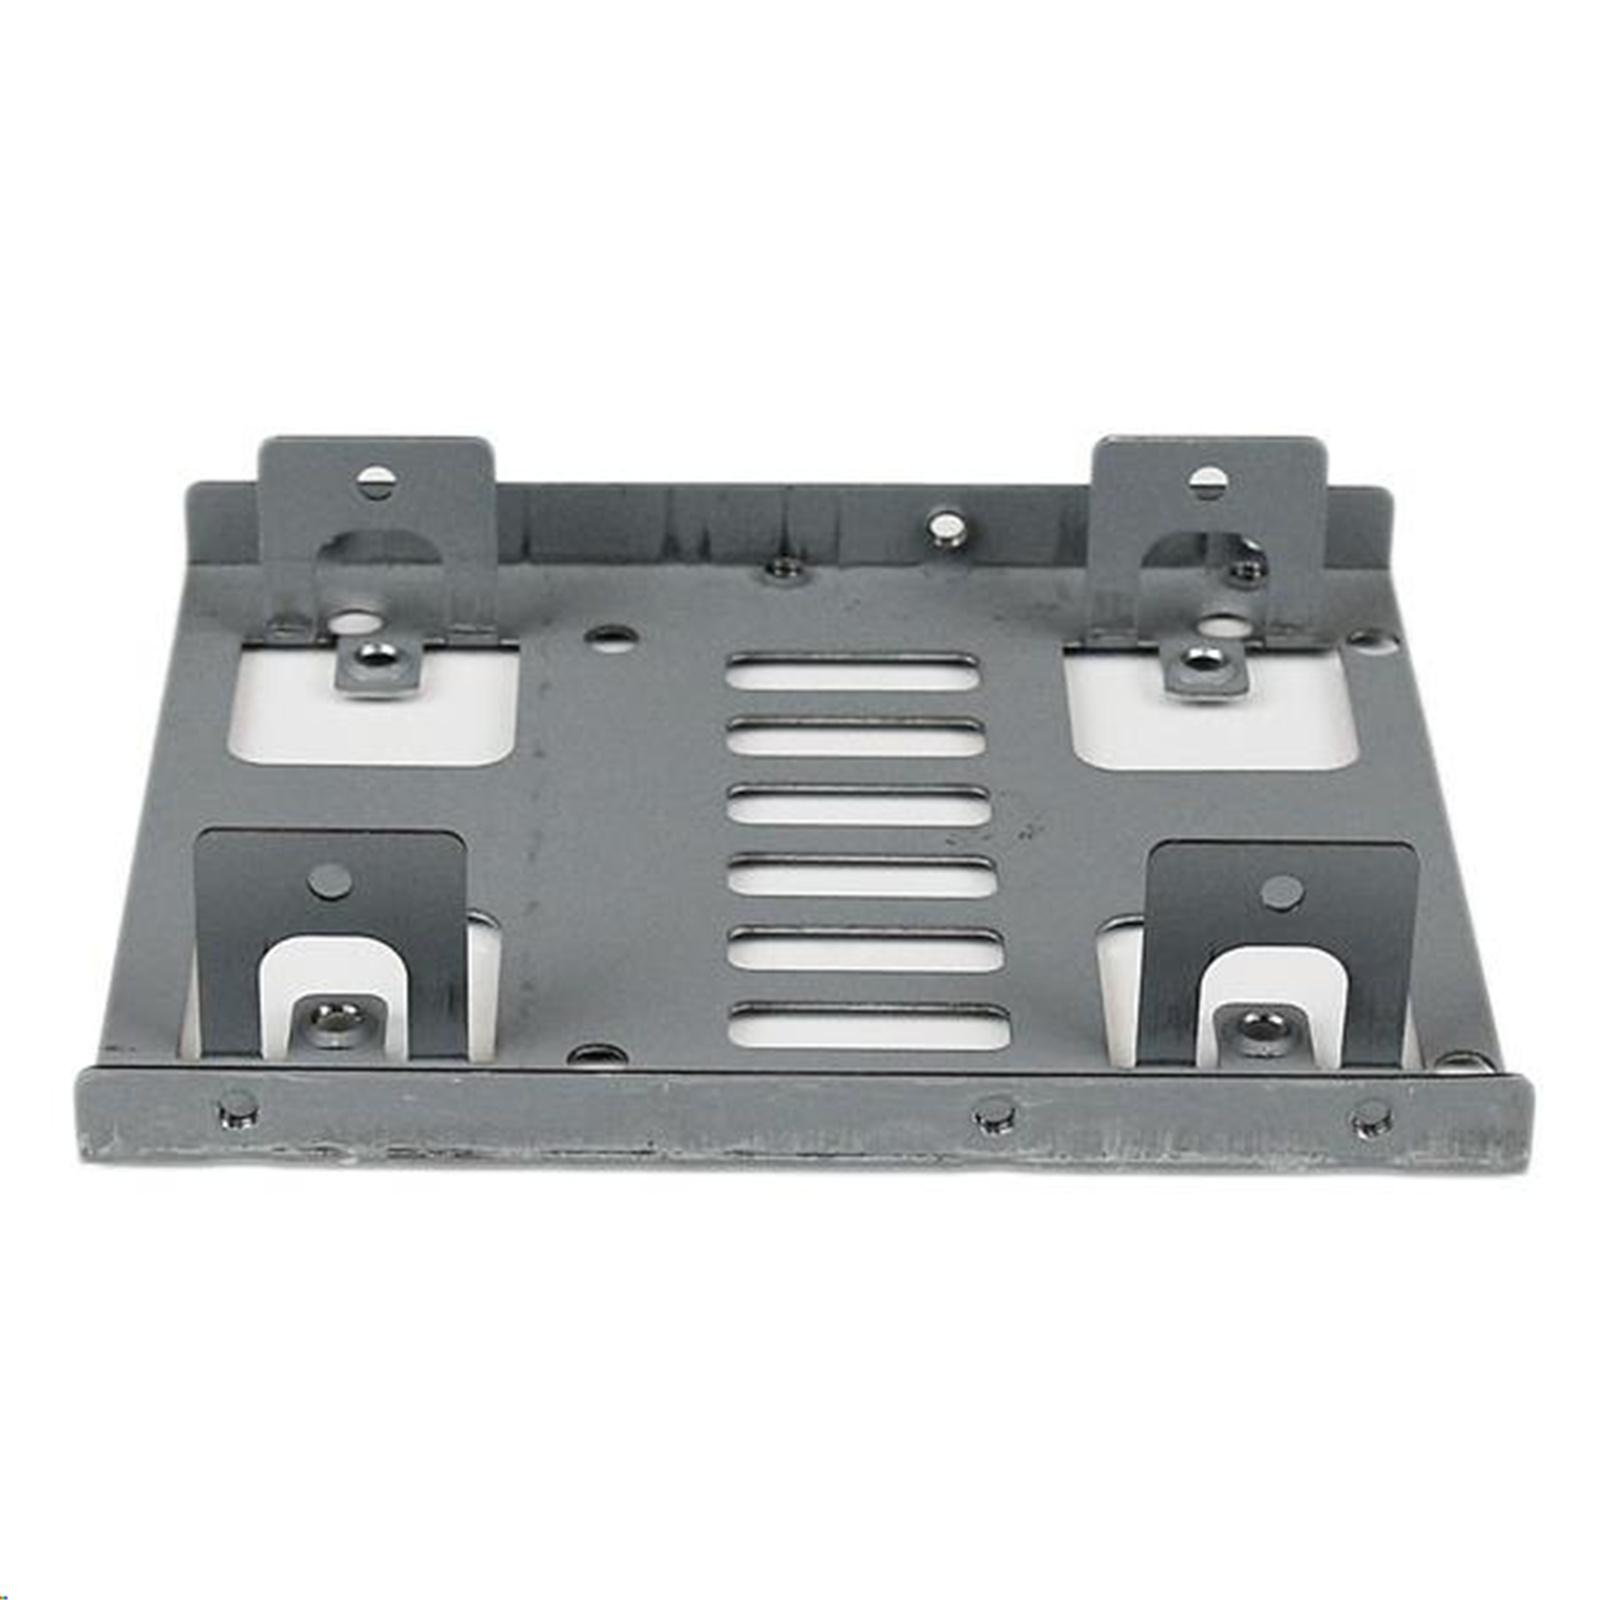 Buy The Startech Bracket25x2 Dual 25 Sata Hdd To 35 Mount Bracket Ssd Black Metal Inch